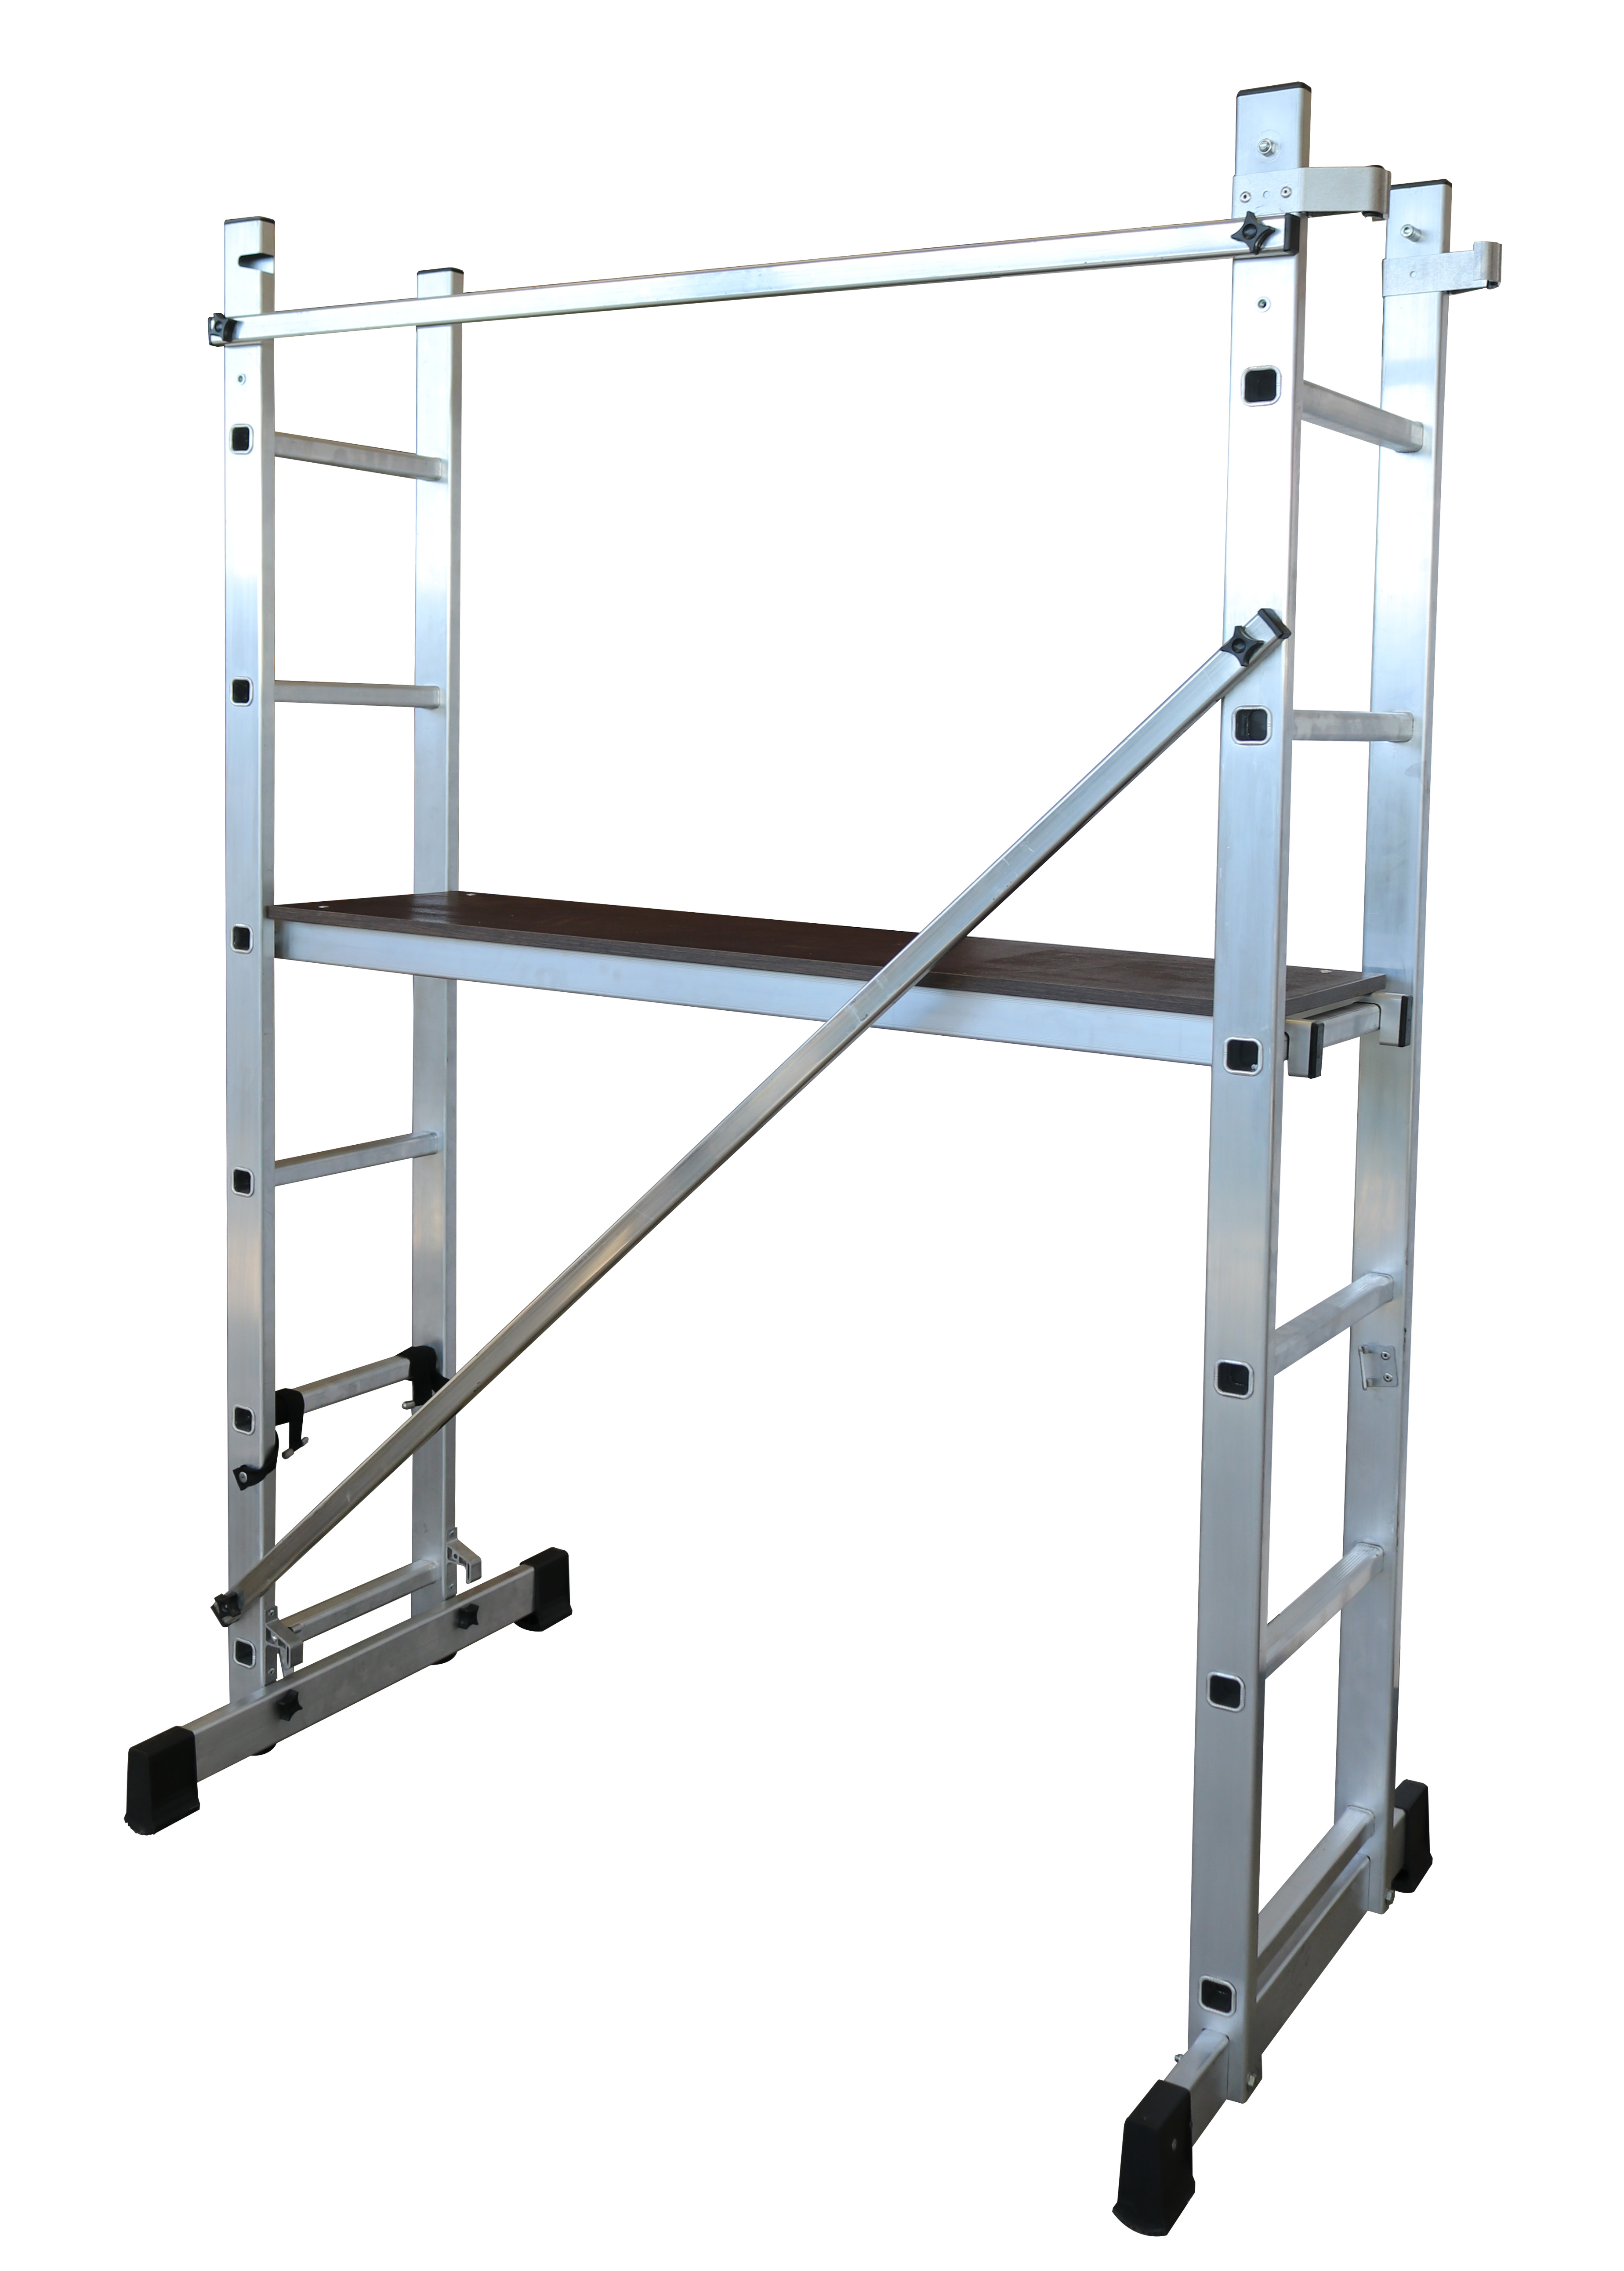 escalera-andamio multiusos Escalera-andamio multiusos escalera andamio 1